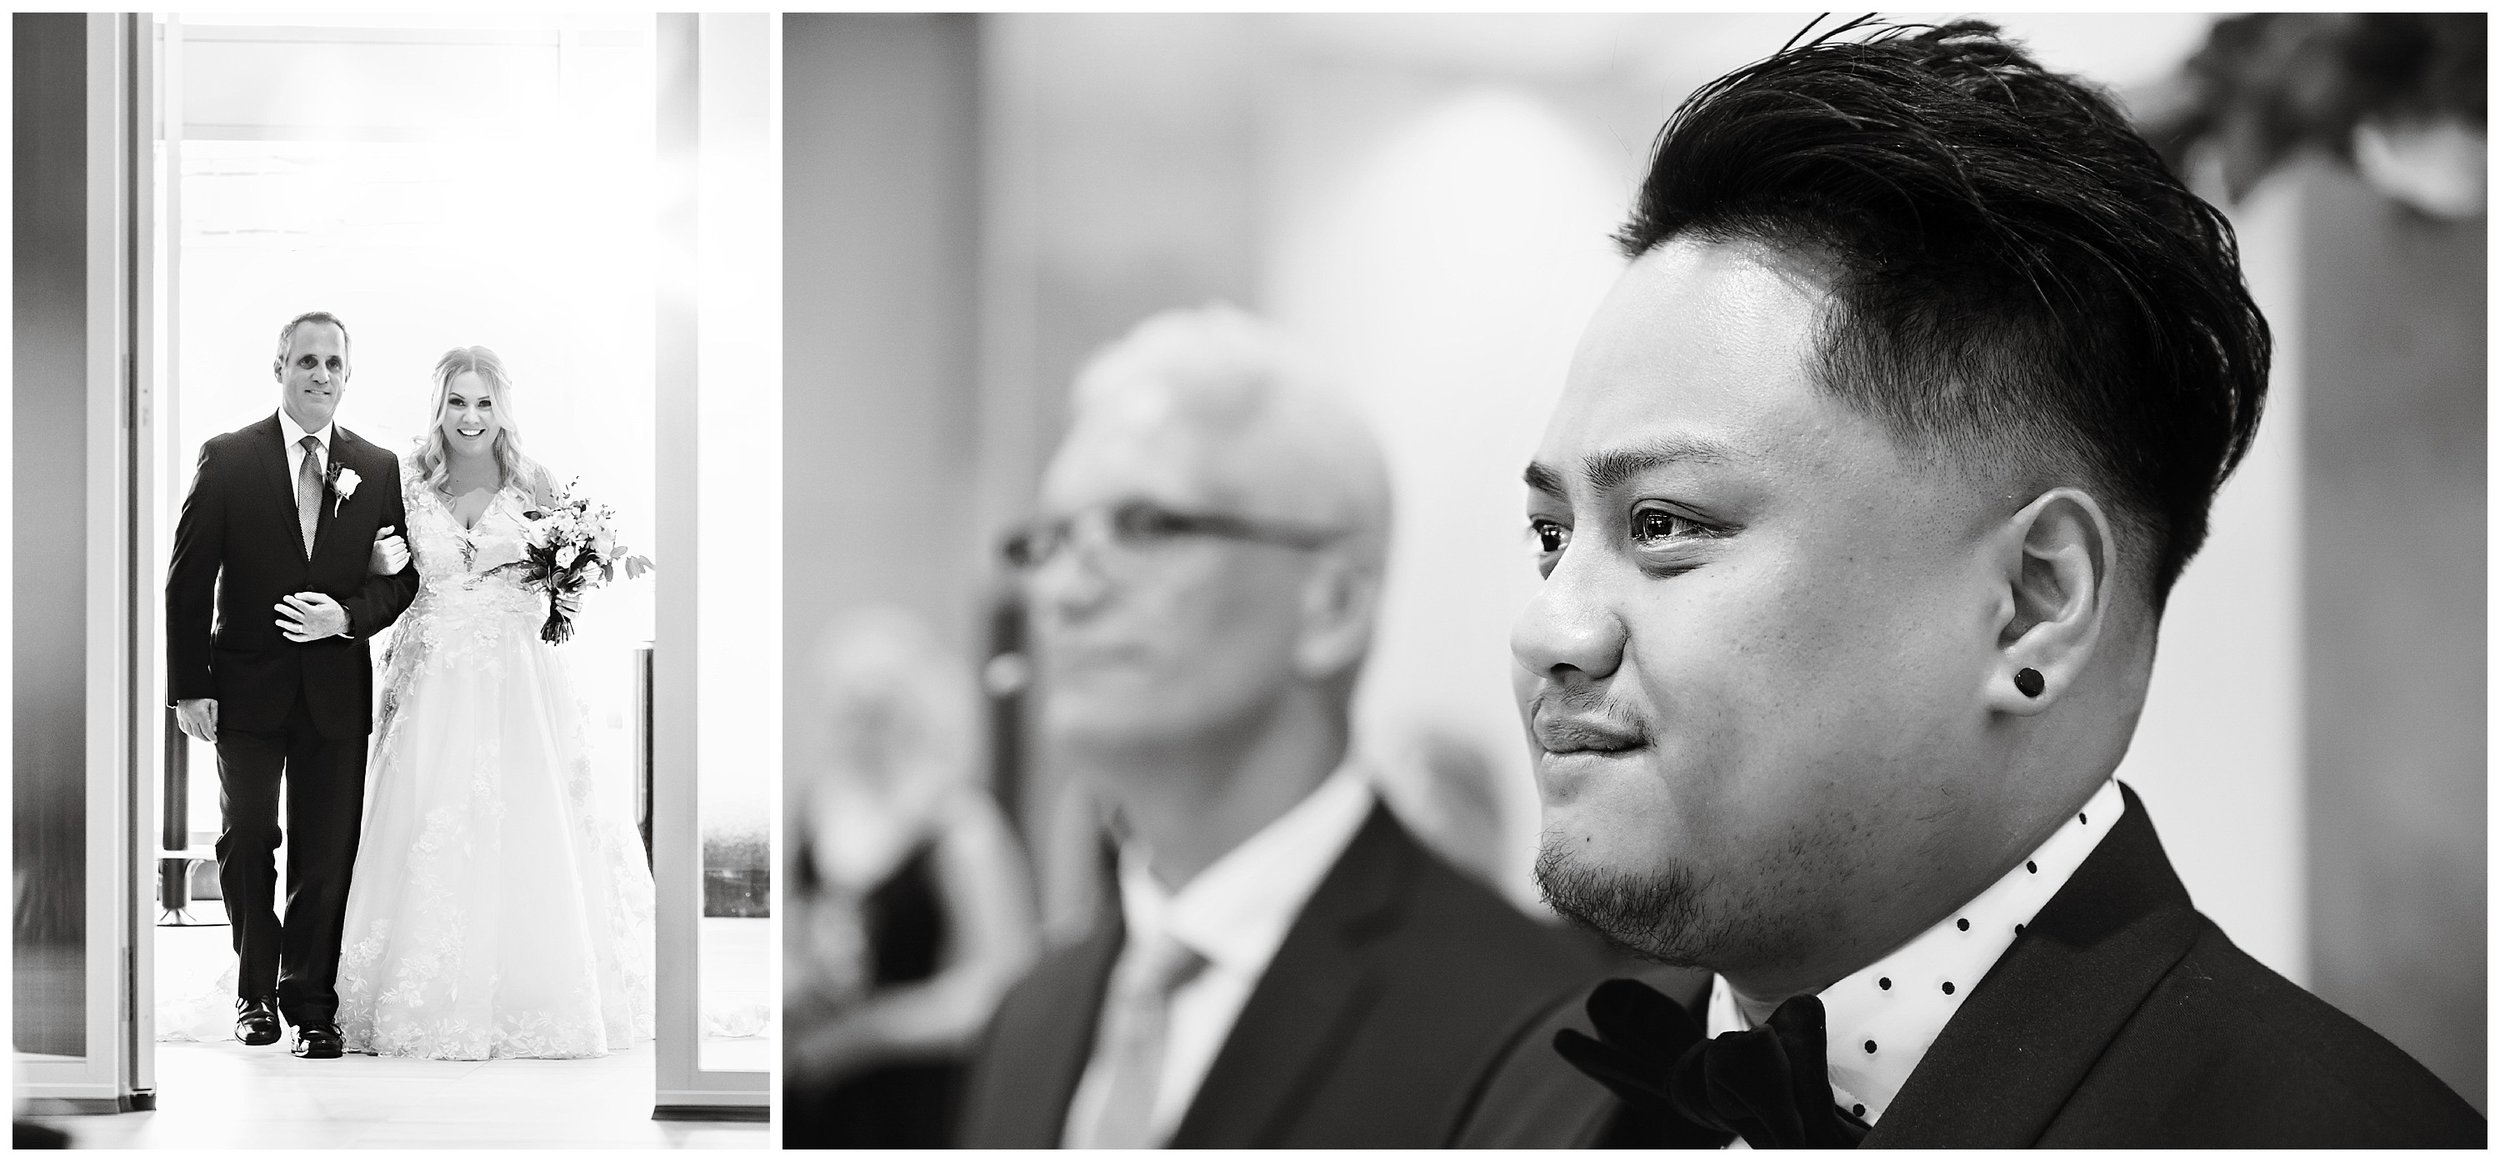 VanDaele-Russell-Wedding-Photography-London-Toronto-Ontario_0095.jpg